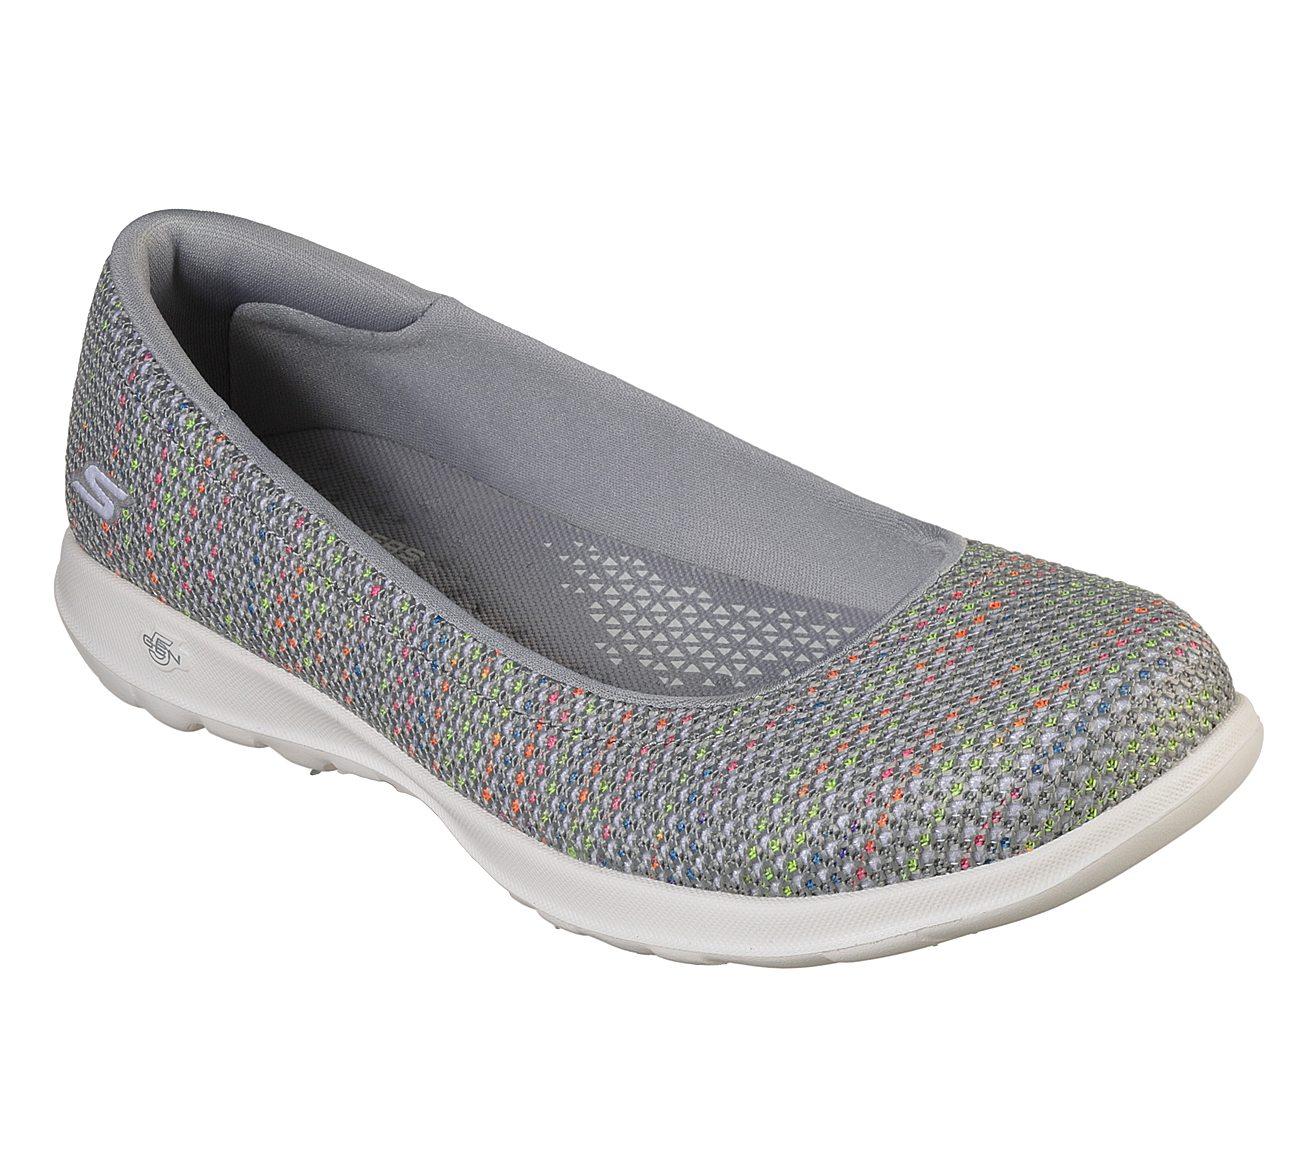 Skechers GOwalk Lite - Summery